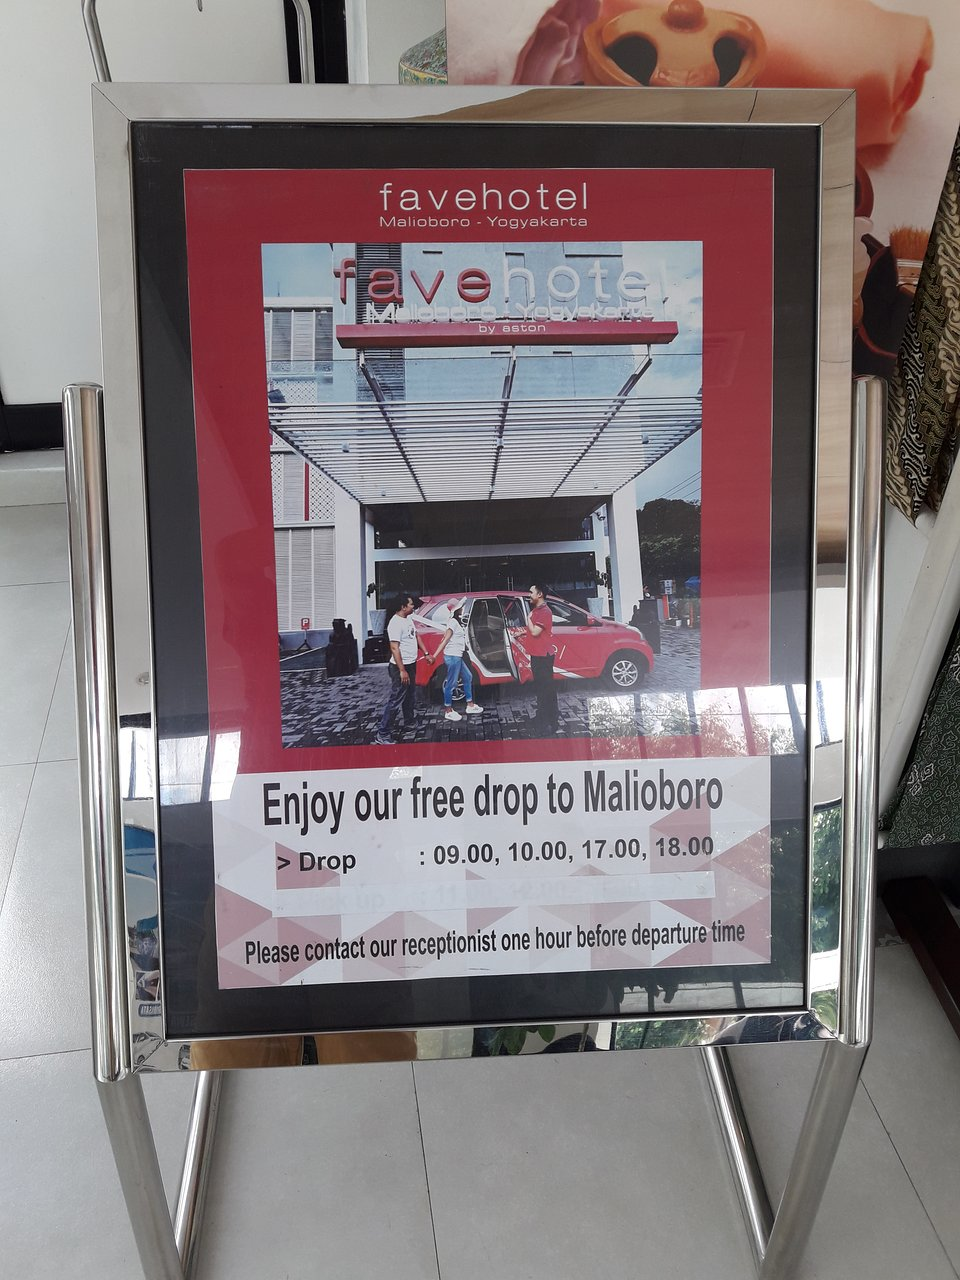 favehotel malioboro yogyakarta 18 2 5 prices hotel reviews rh tripadvisor com